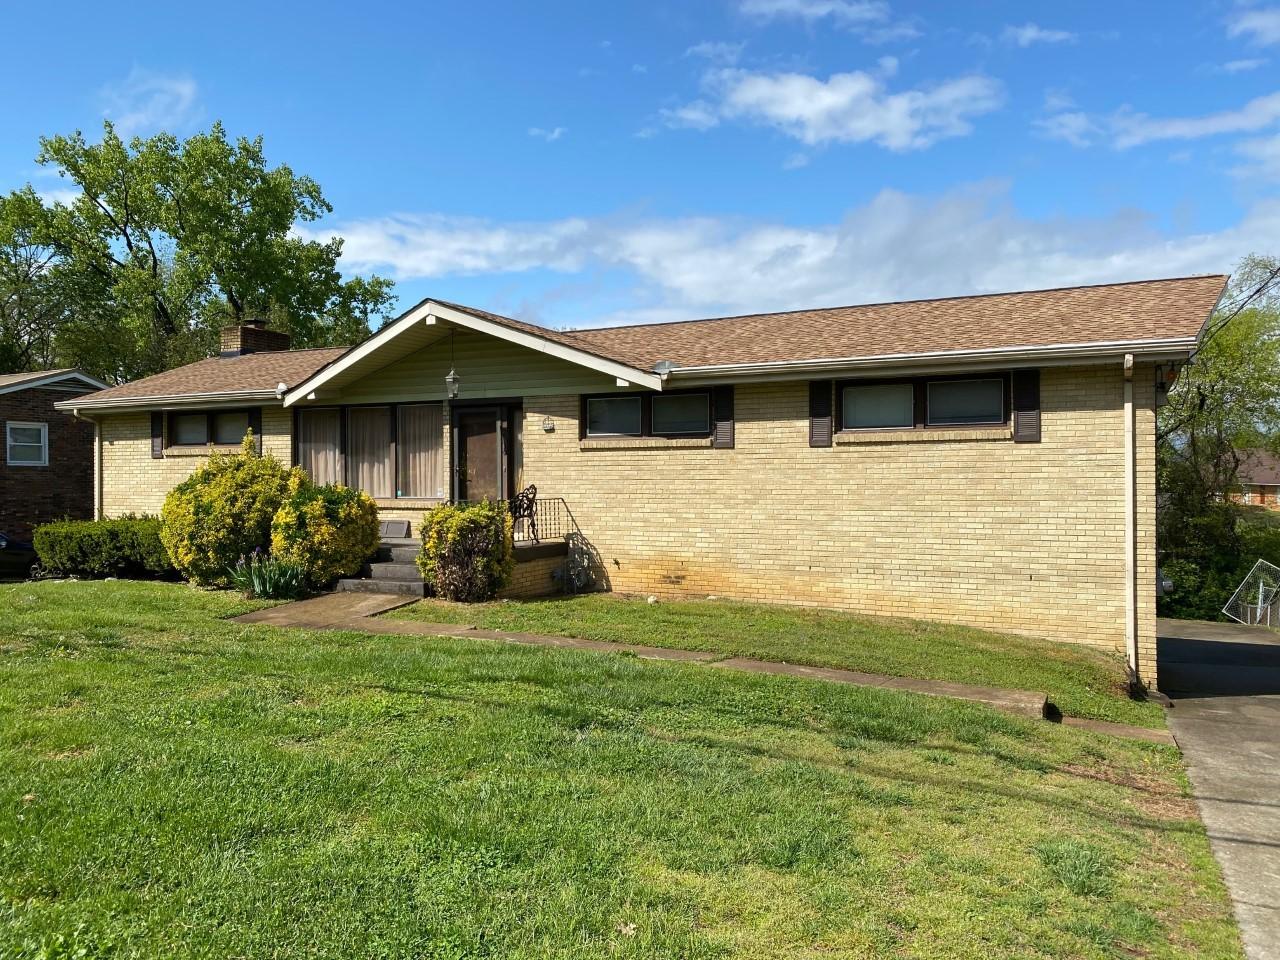 2730 Mossdale Dr Property Photo - Nashville, TN real estate listing